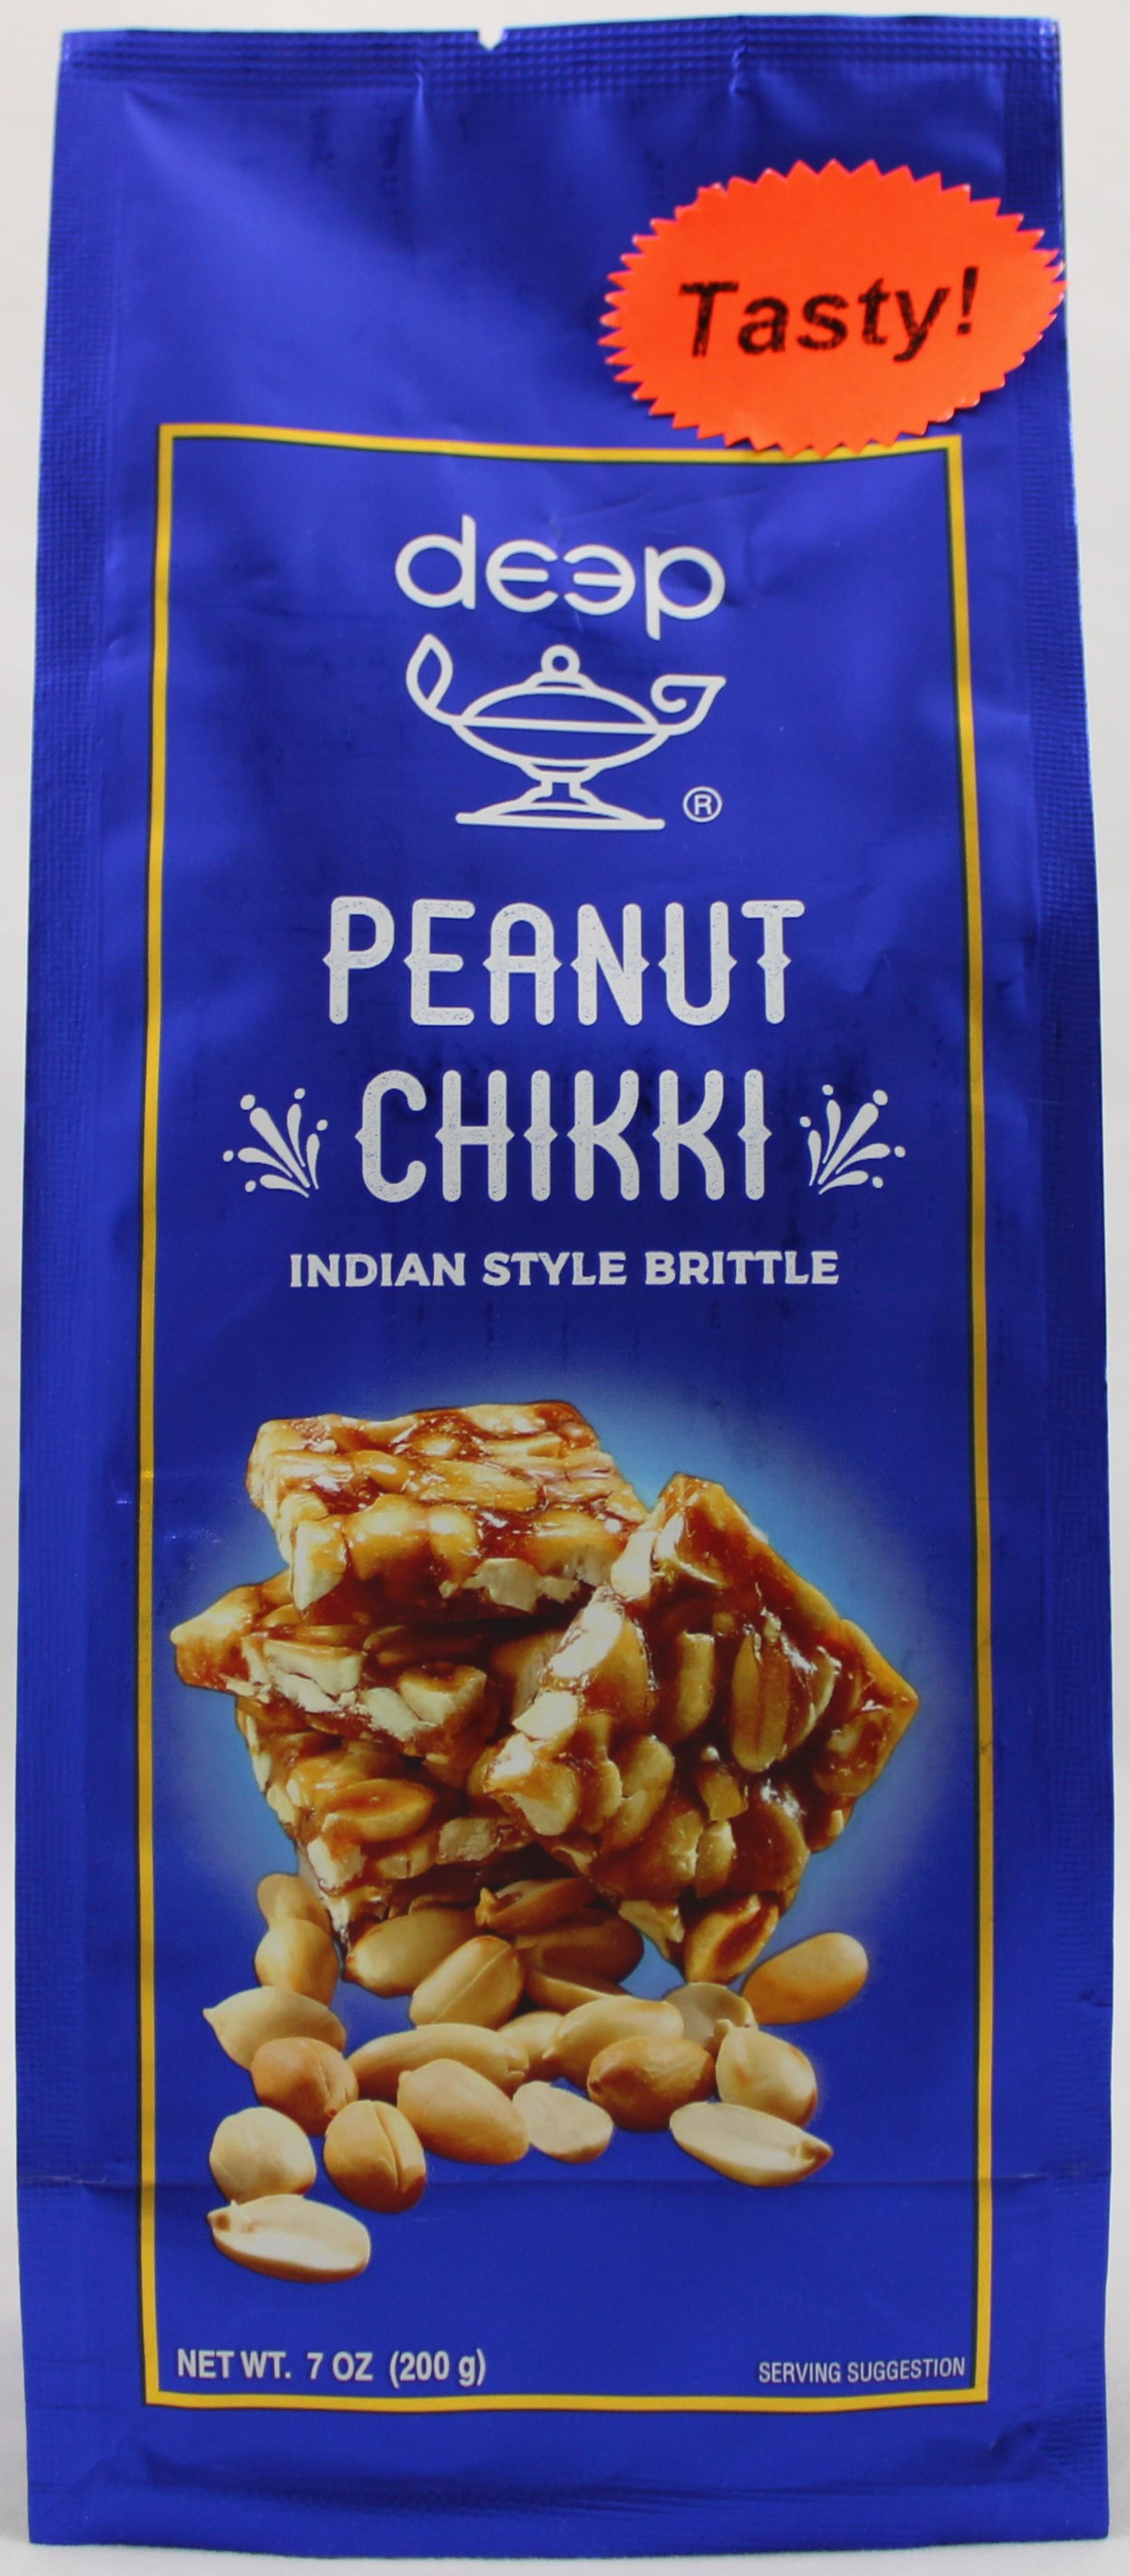 Indian Grocery - Peanut Chikki 7oz